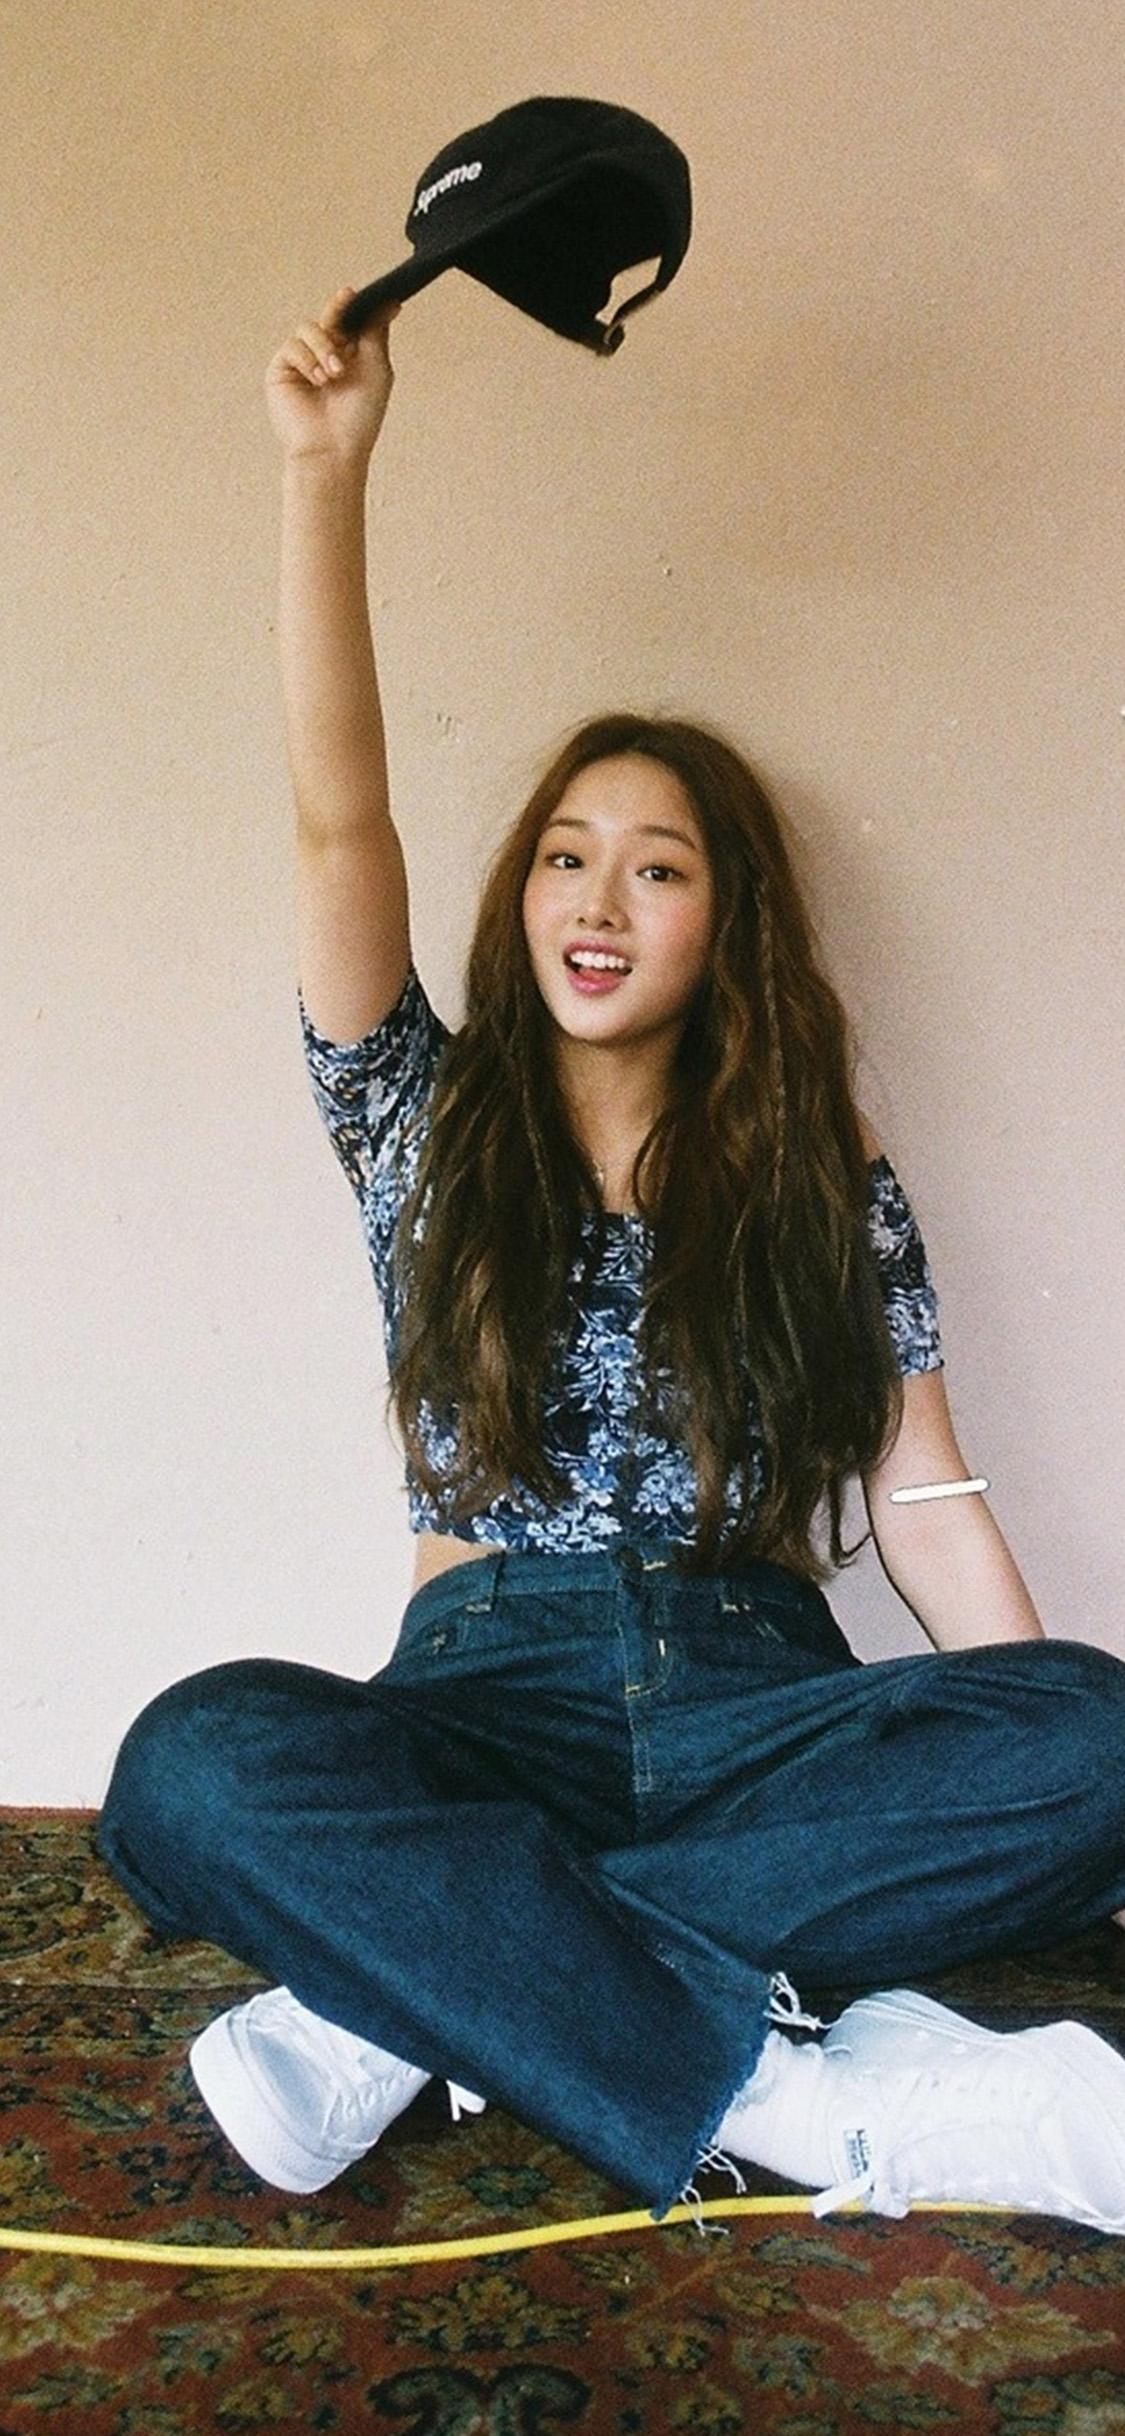 iPhonexpapers.com-Apple-iPhone-wallpaper-ho81-kpop-girl-smile-cute-woman-asian